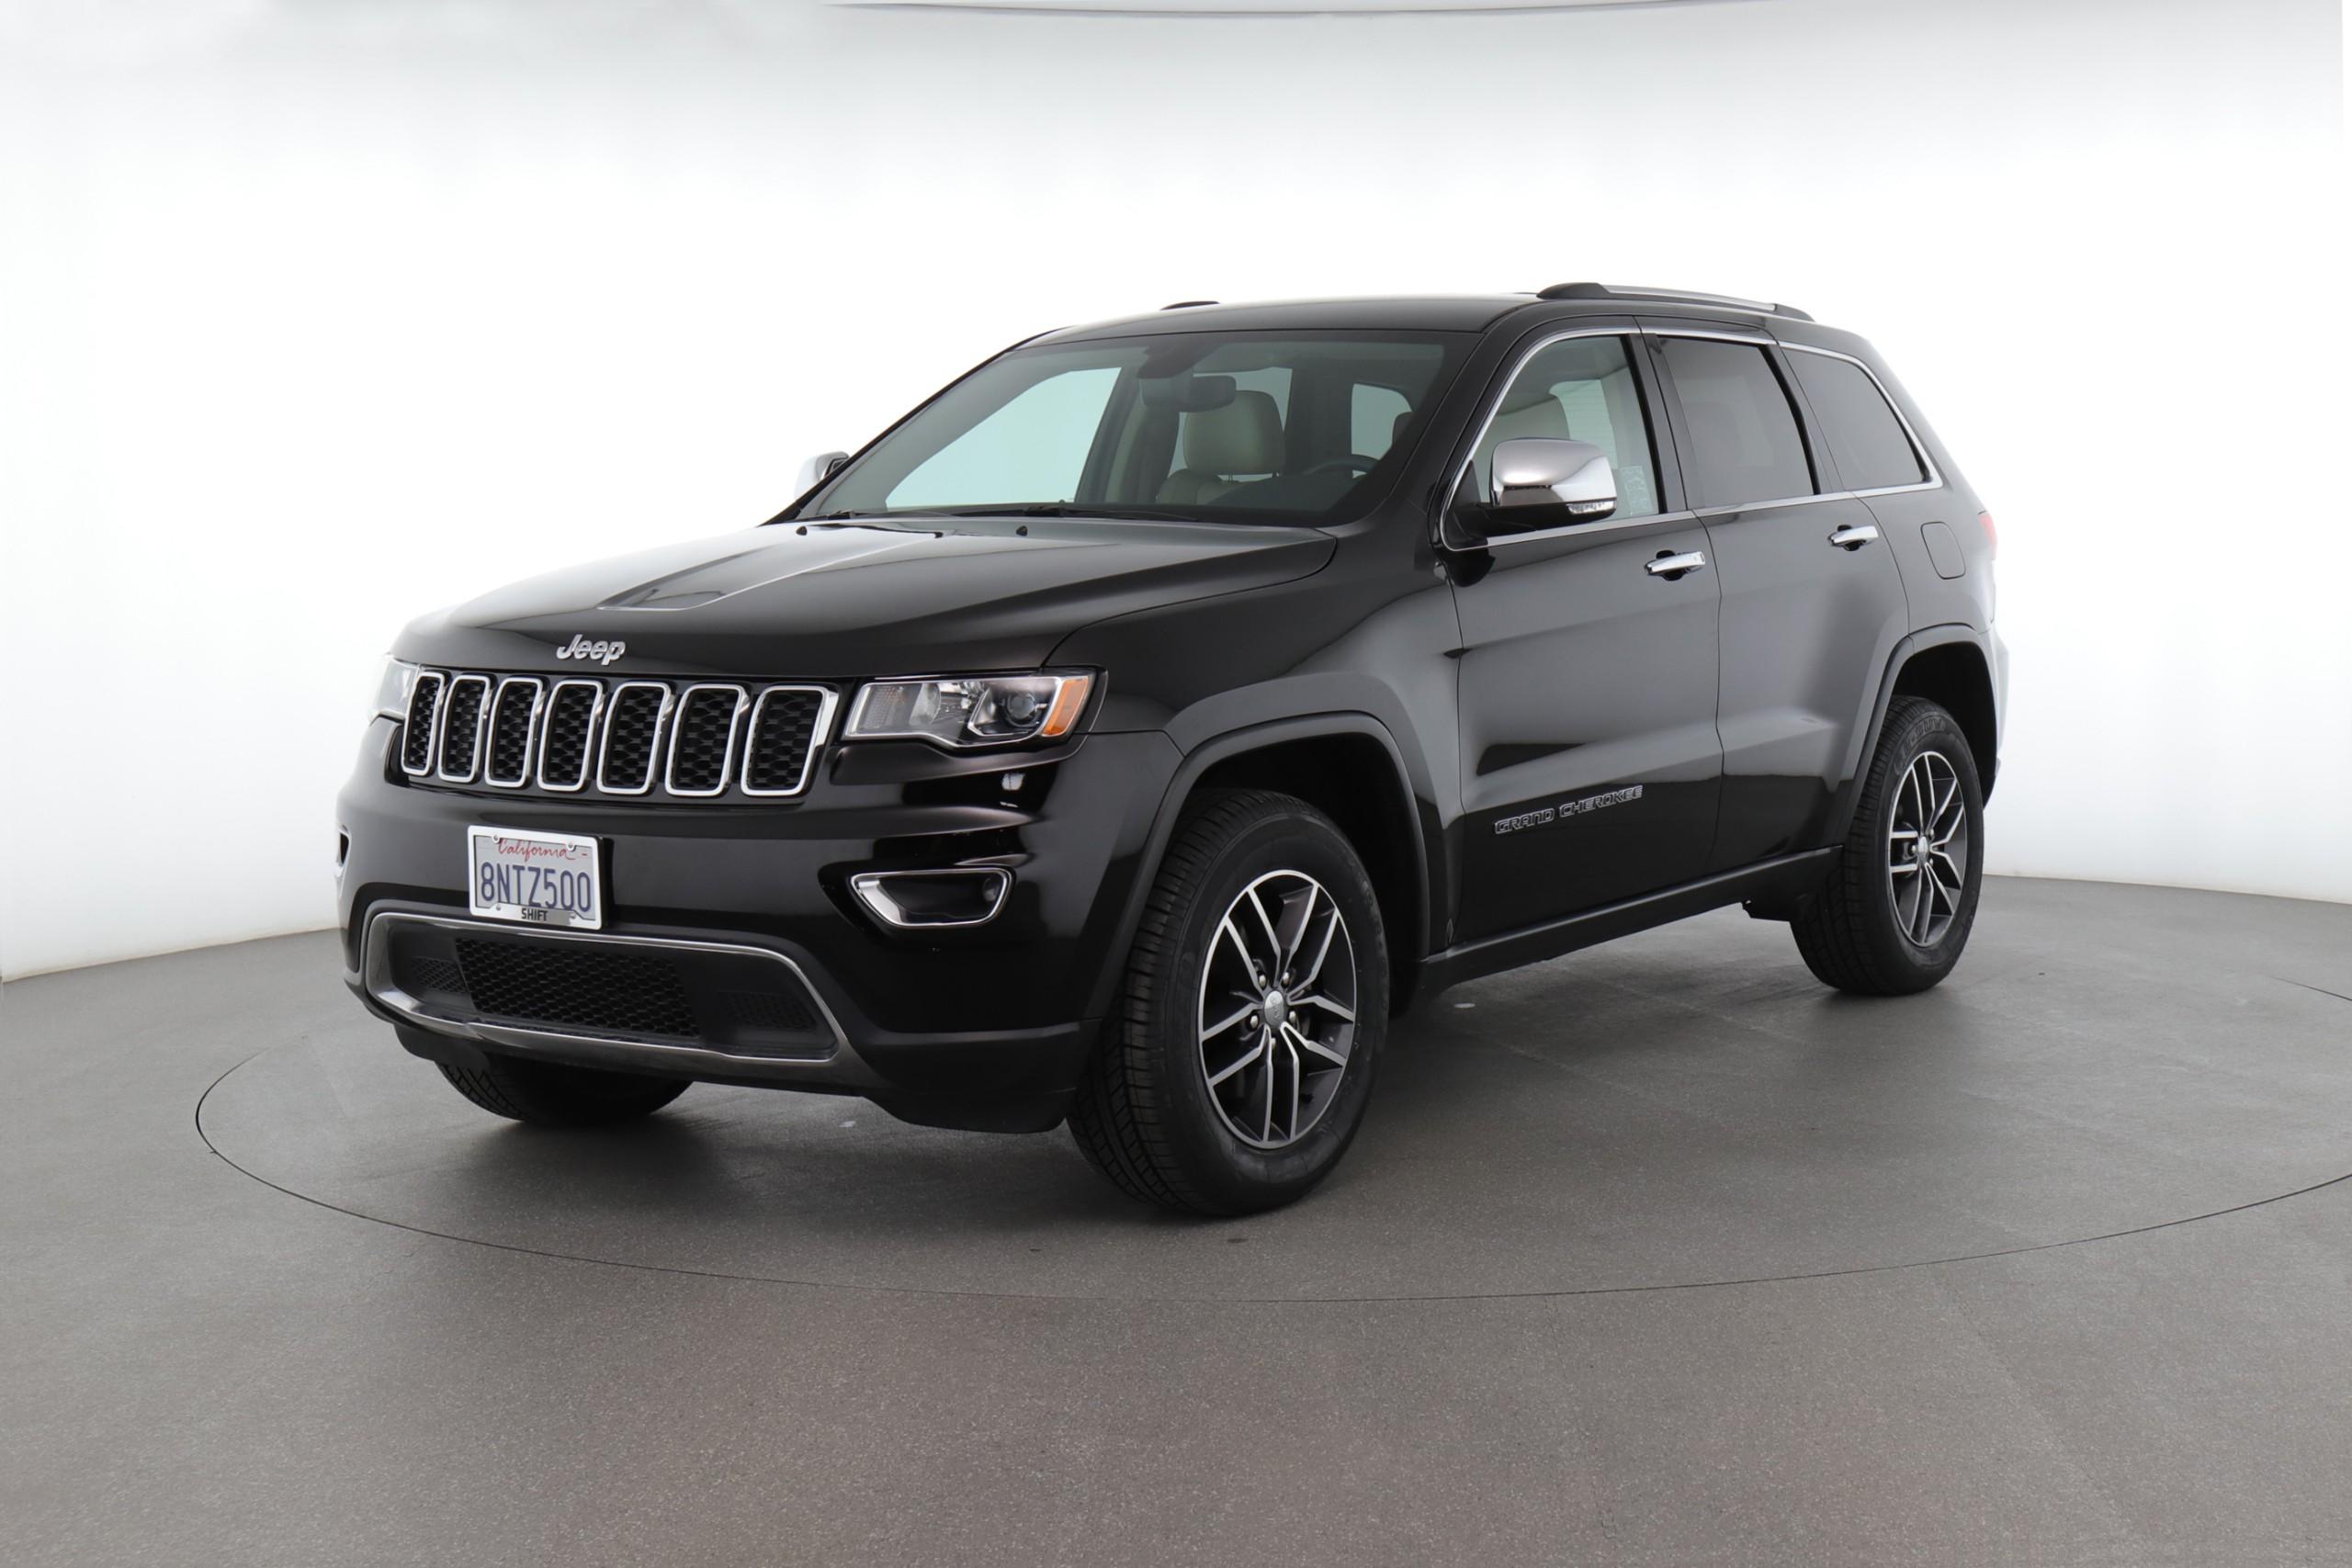 6. Jeep Grand Cherokee